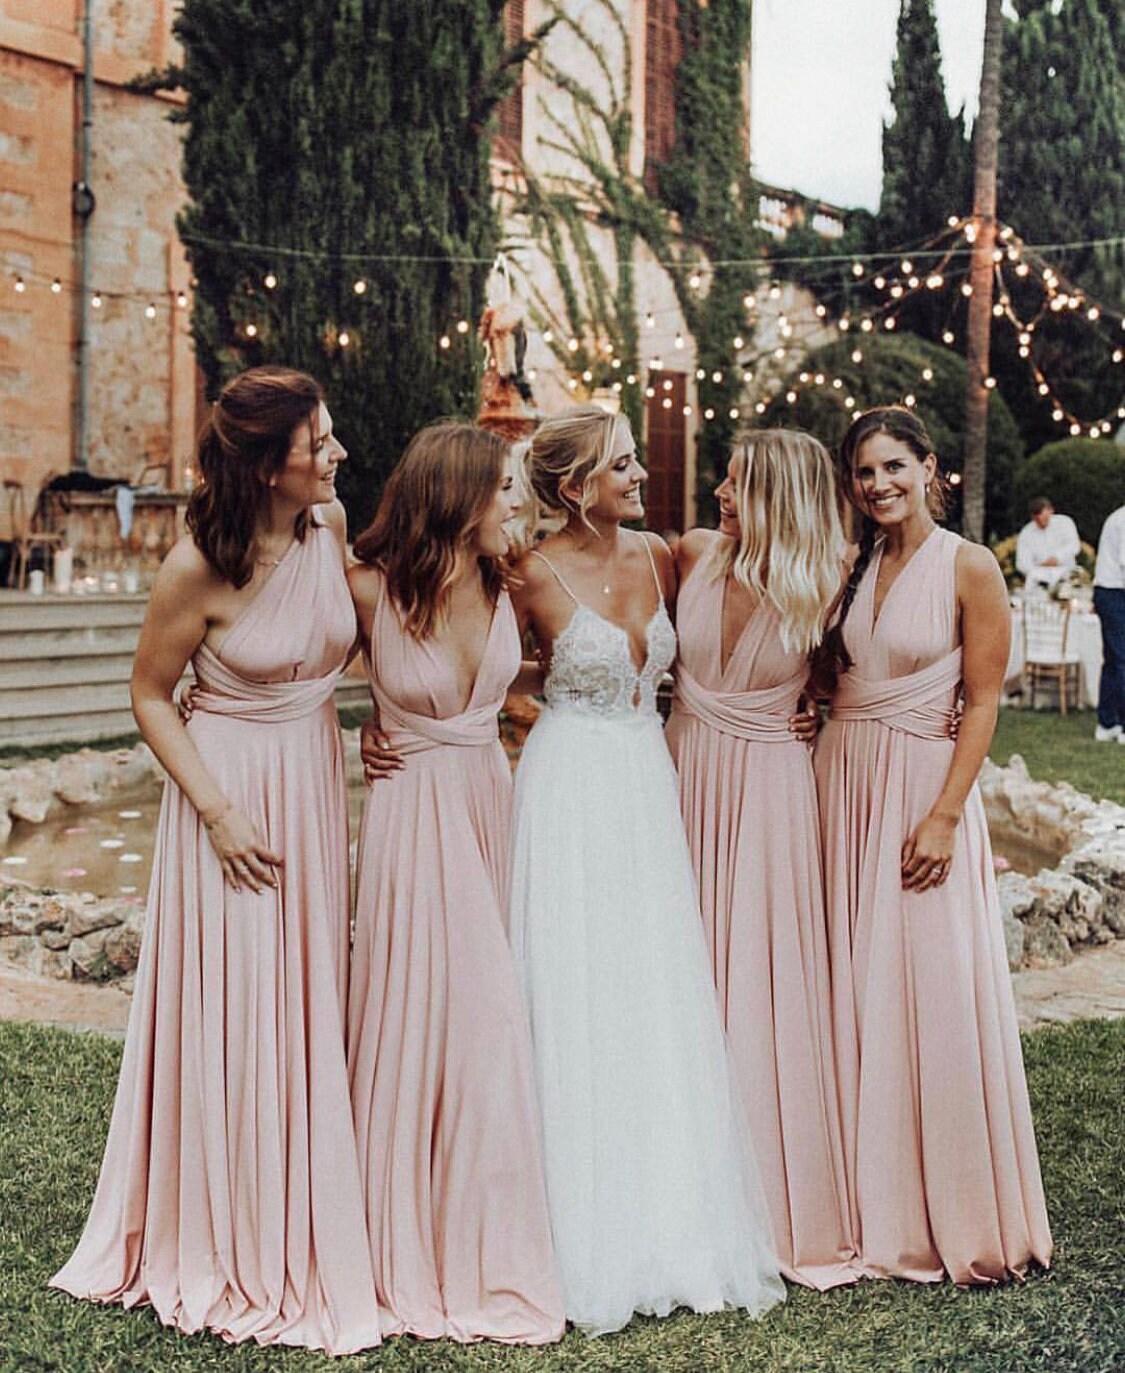 10875f271418d LONG Bridesmaid Dress // Infinity Dress // Floor Length // Maxi Wrap //  Convertible Dusty Rose Dress // Wedding Dress // Multiway Dress